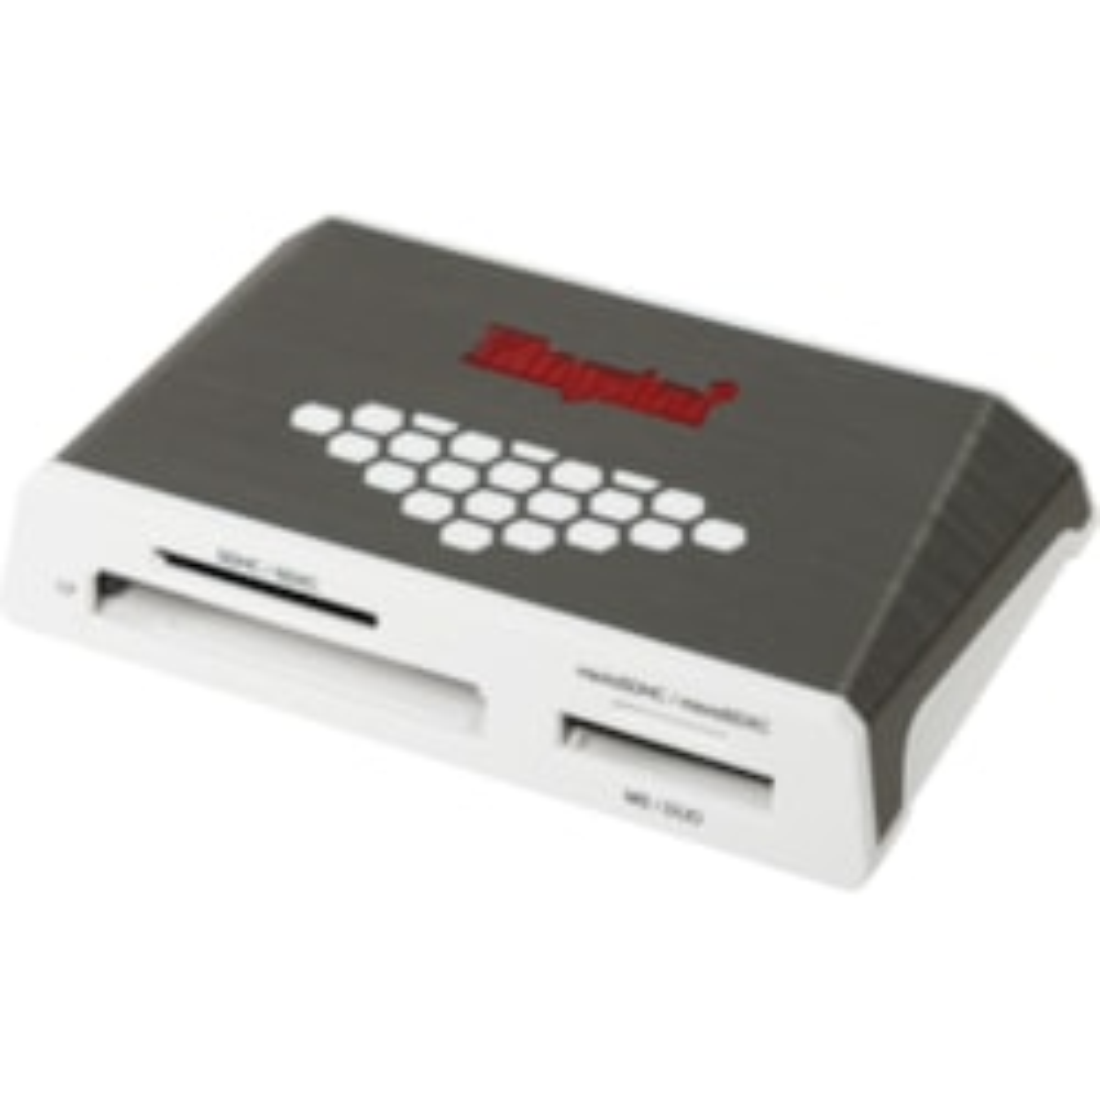 Kingston Flash Reader - USB 3.0 - External